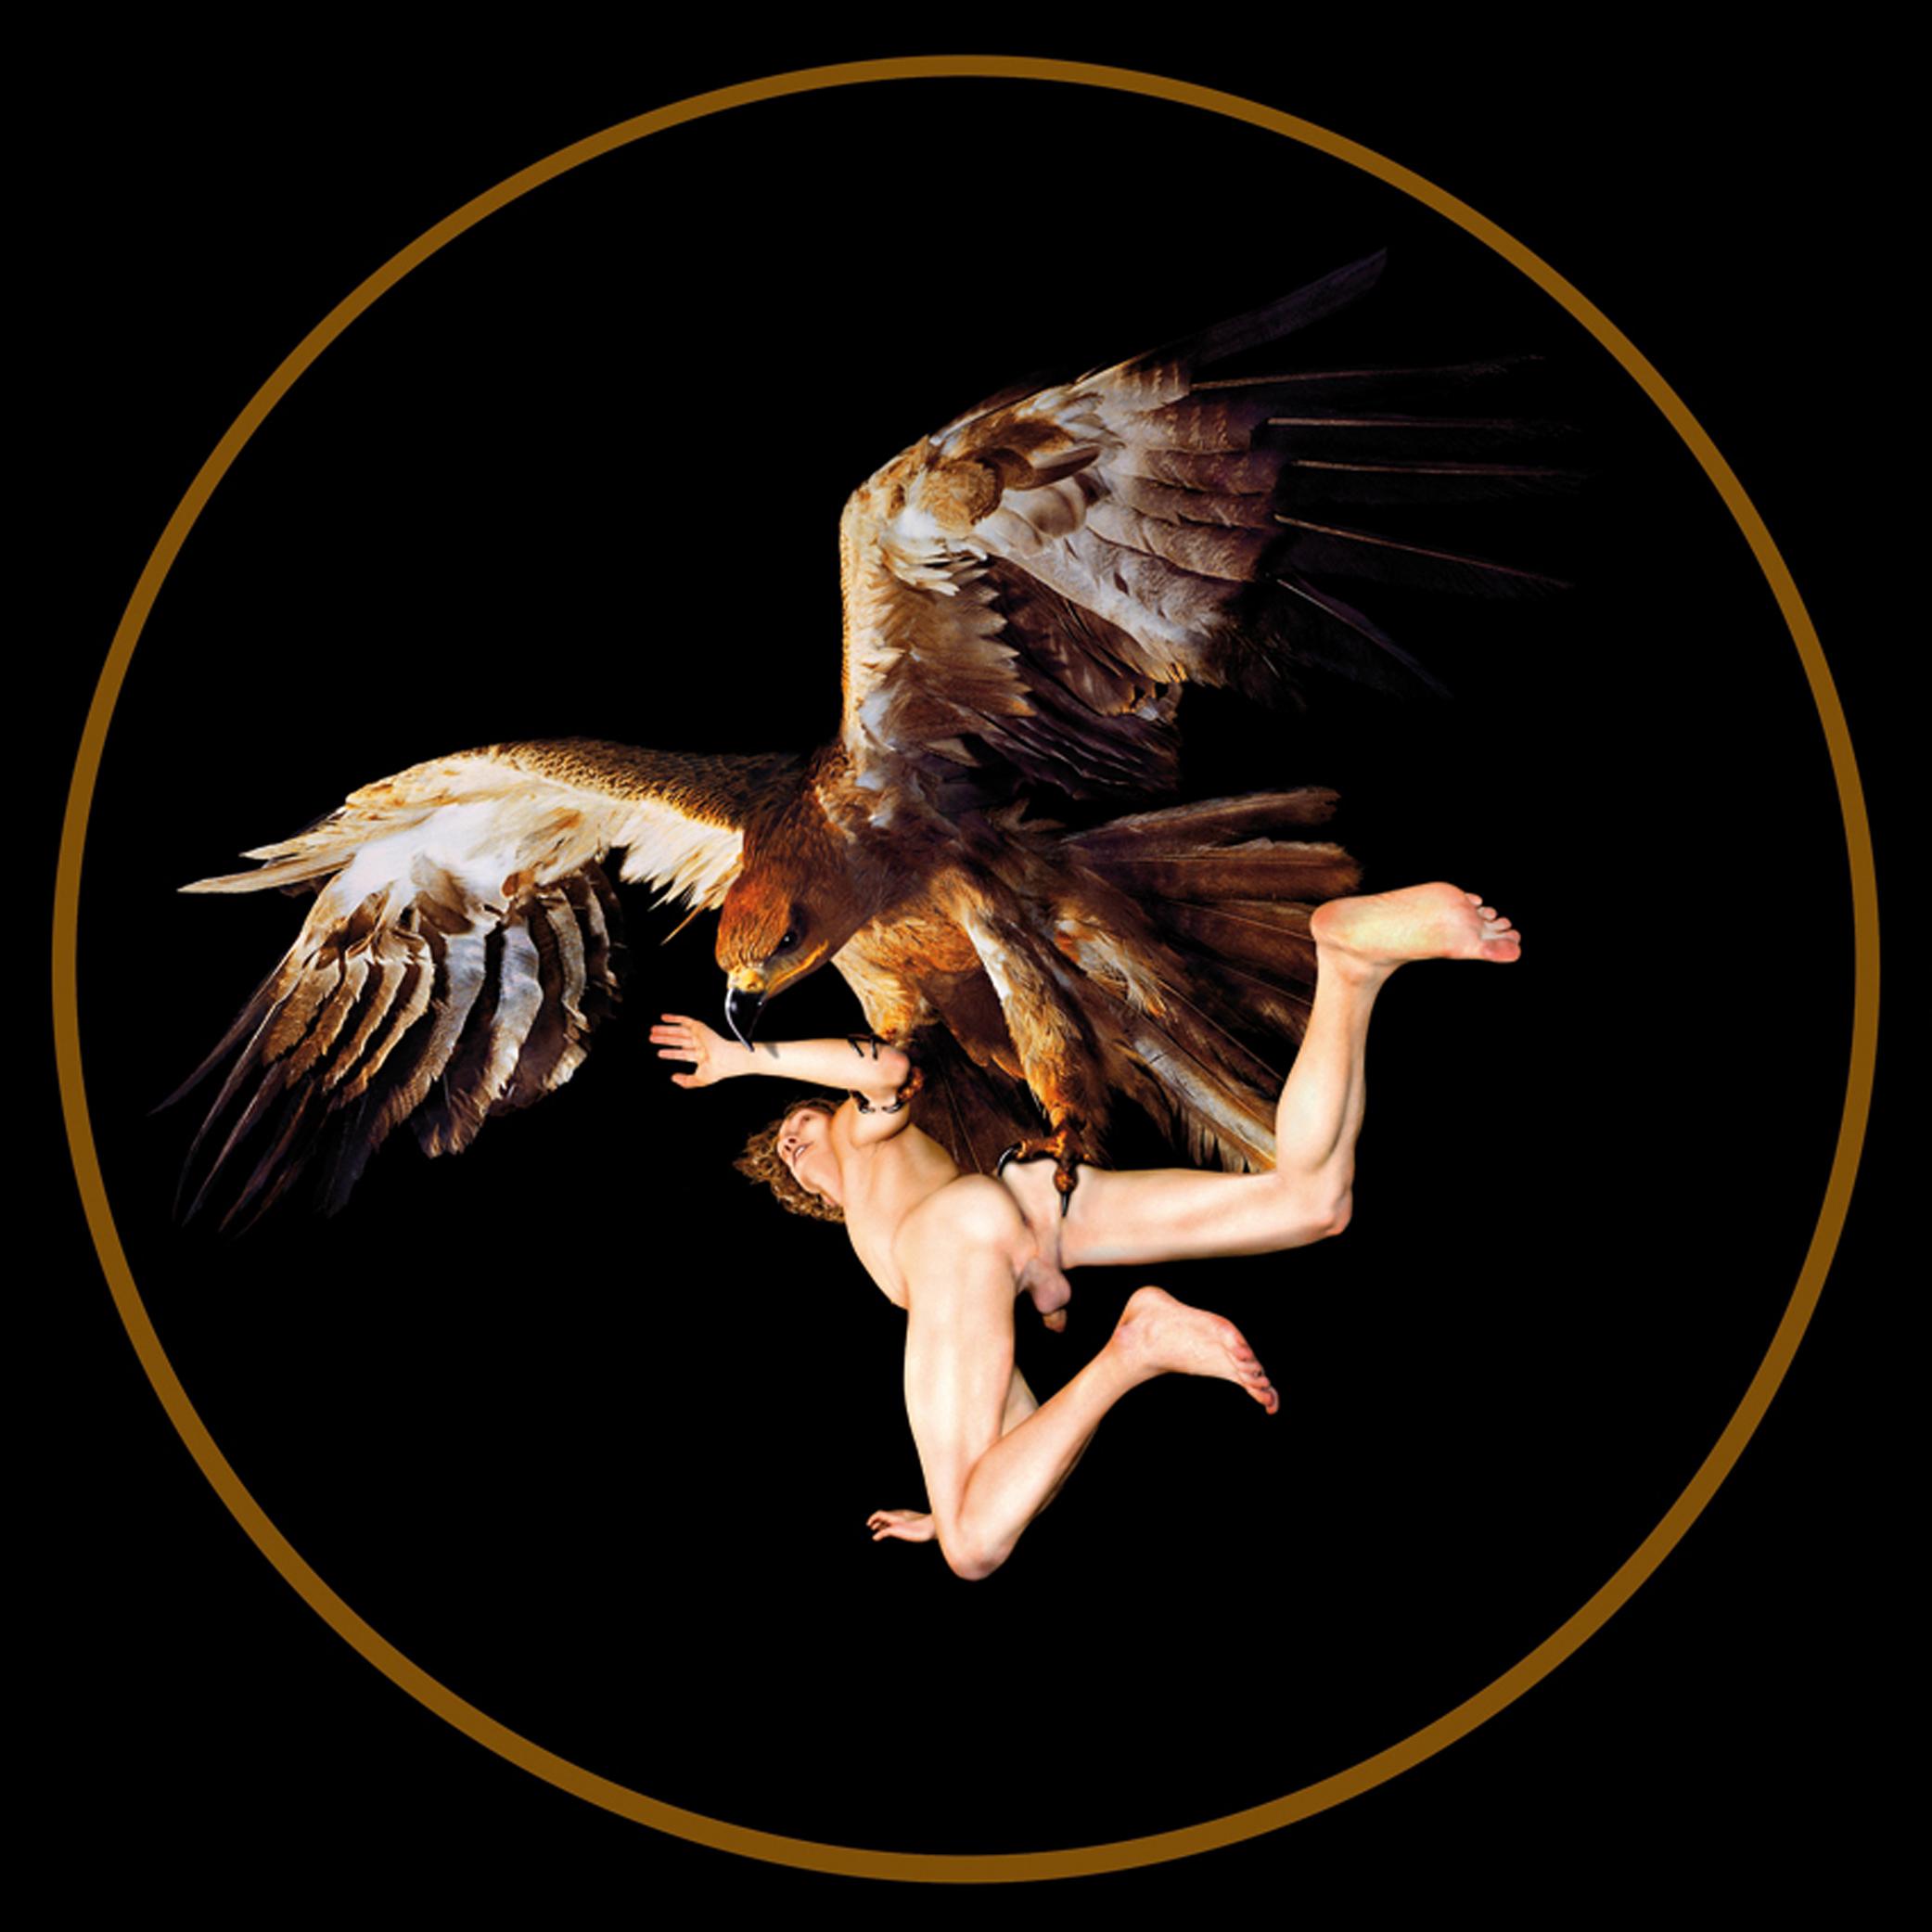 Ganymedes mataro da vergato premio celeste 2010 for Studi mataro